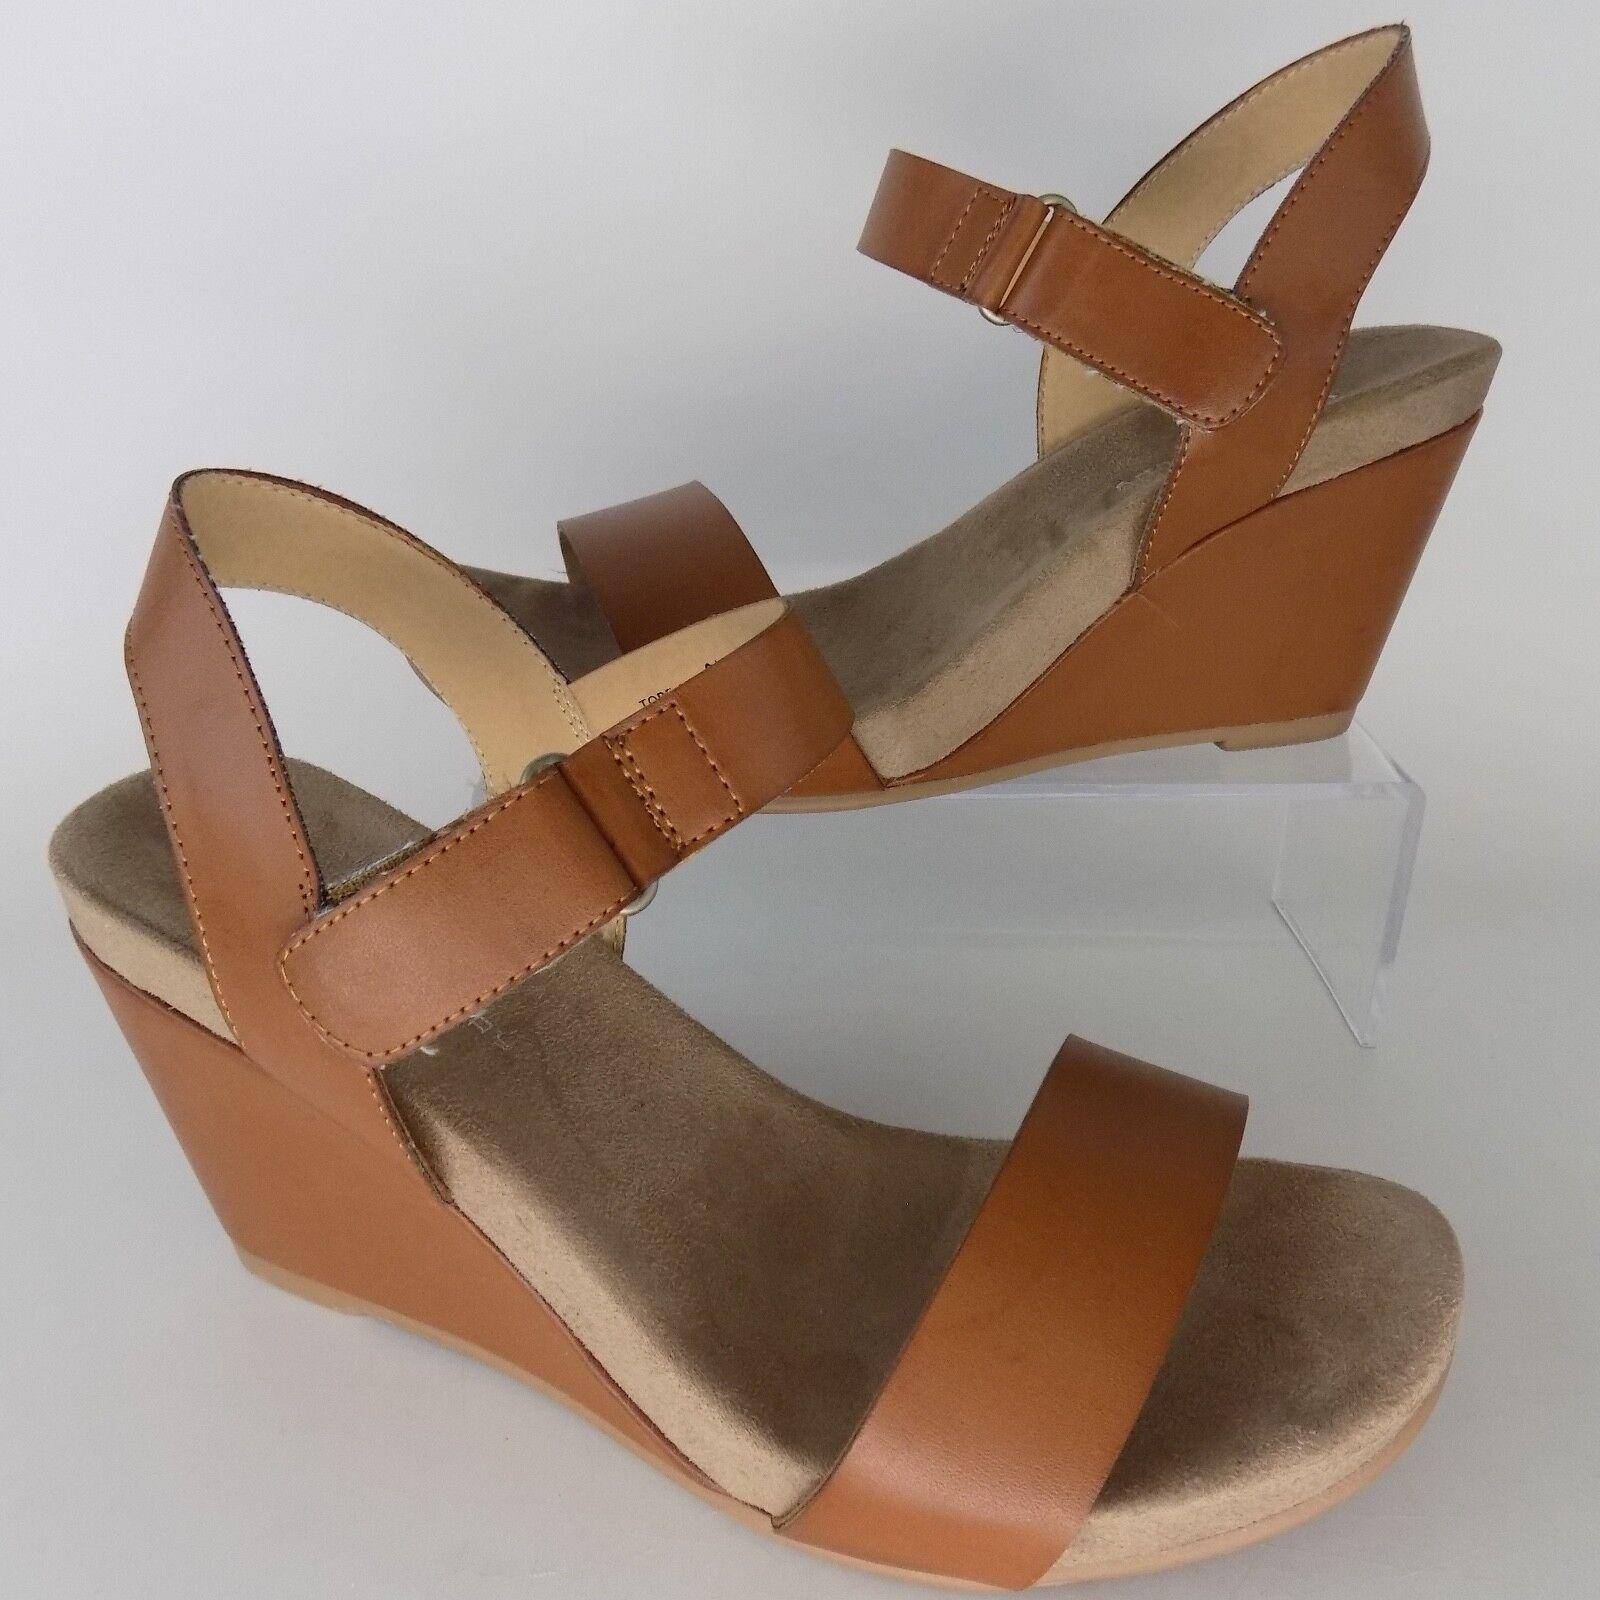 CL LAUNDRY Trudy Brown Sandals Wedge Heels Sandals Brown Women Shoes Sz 9 AL4074 2448fd